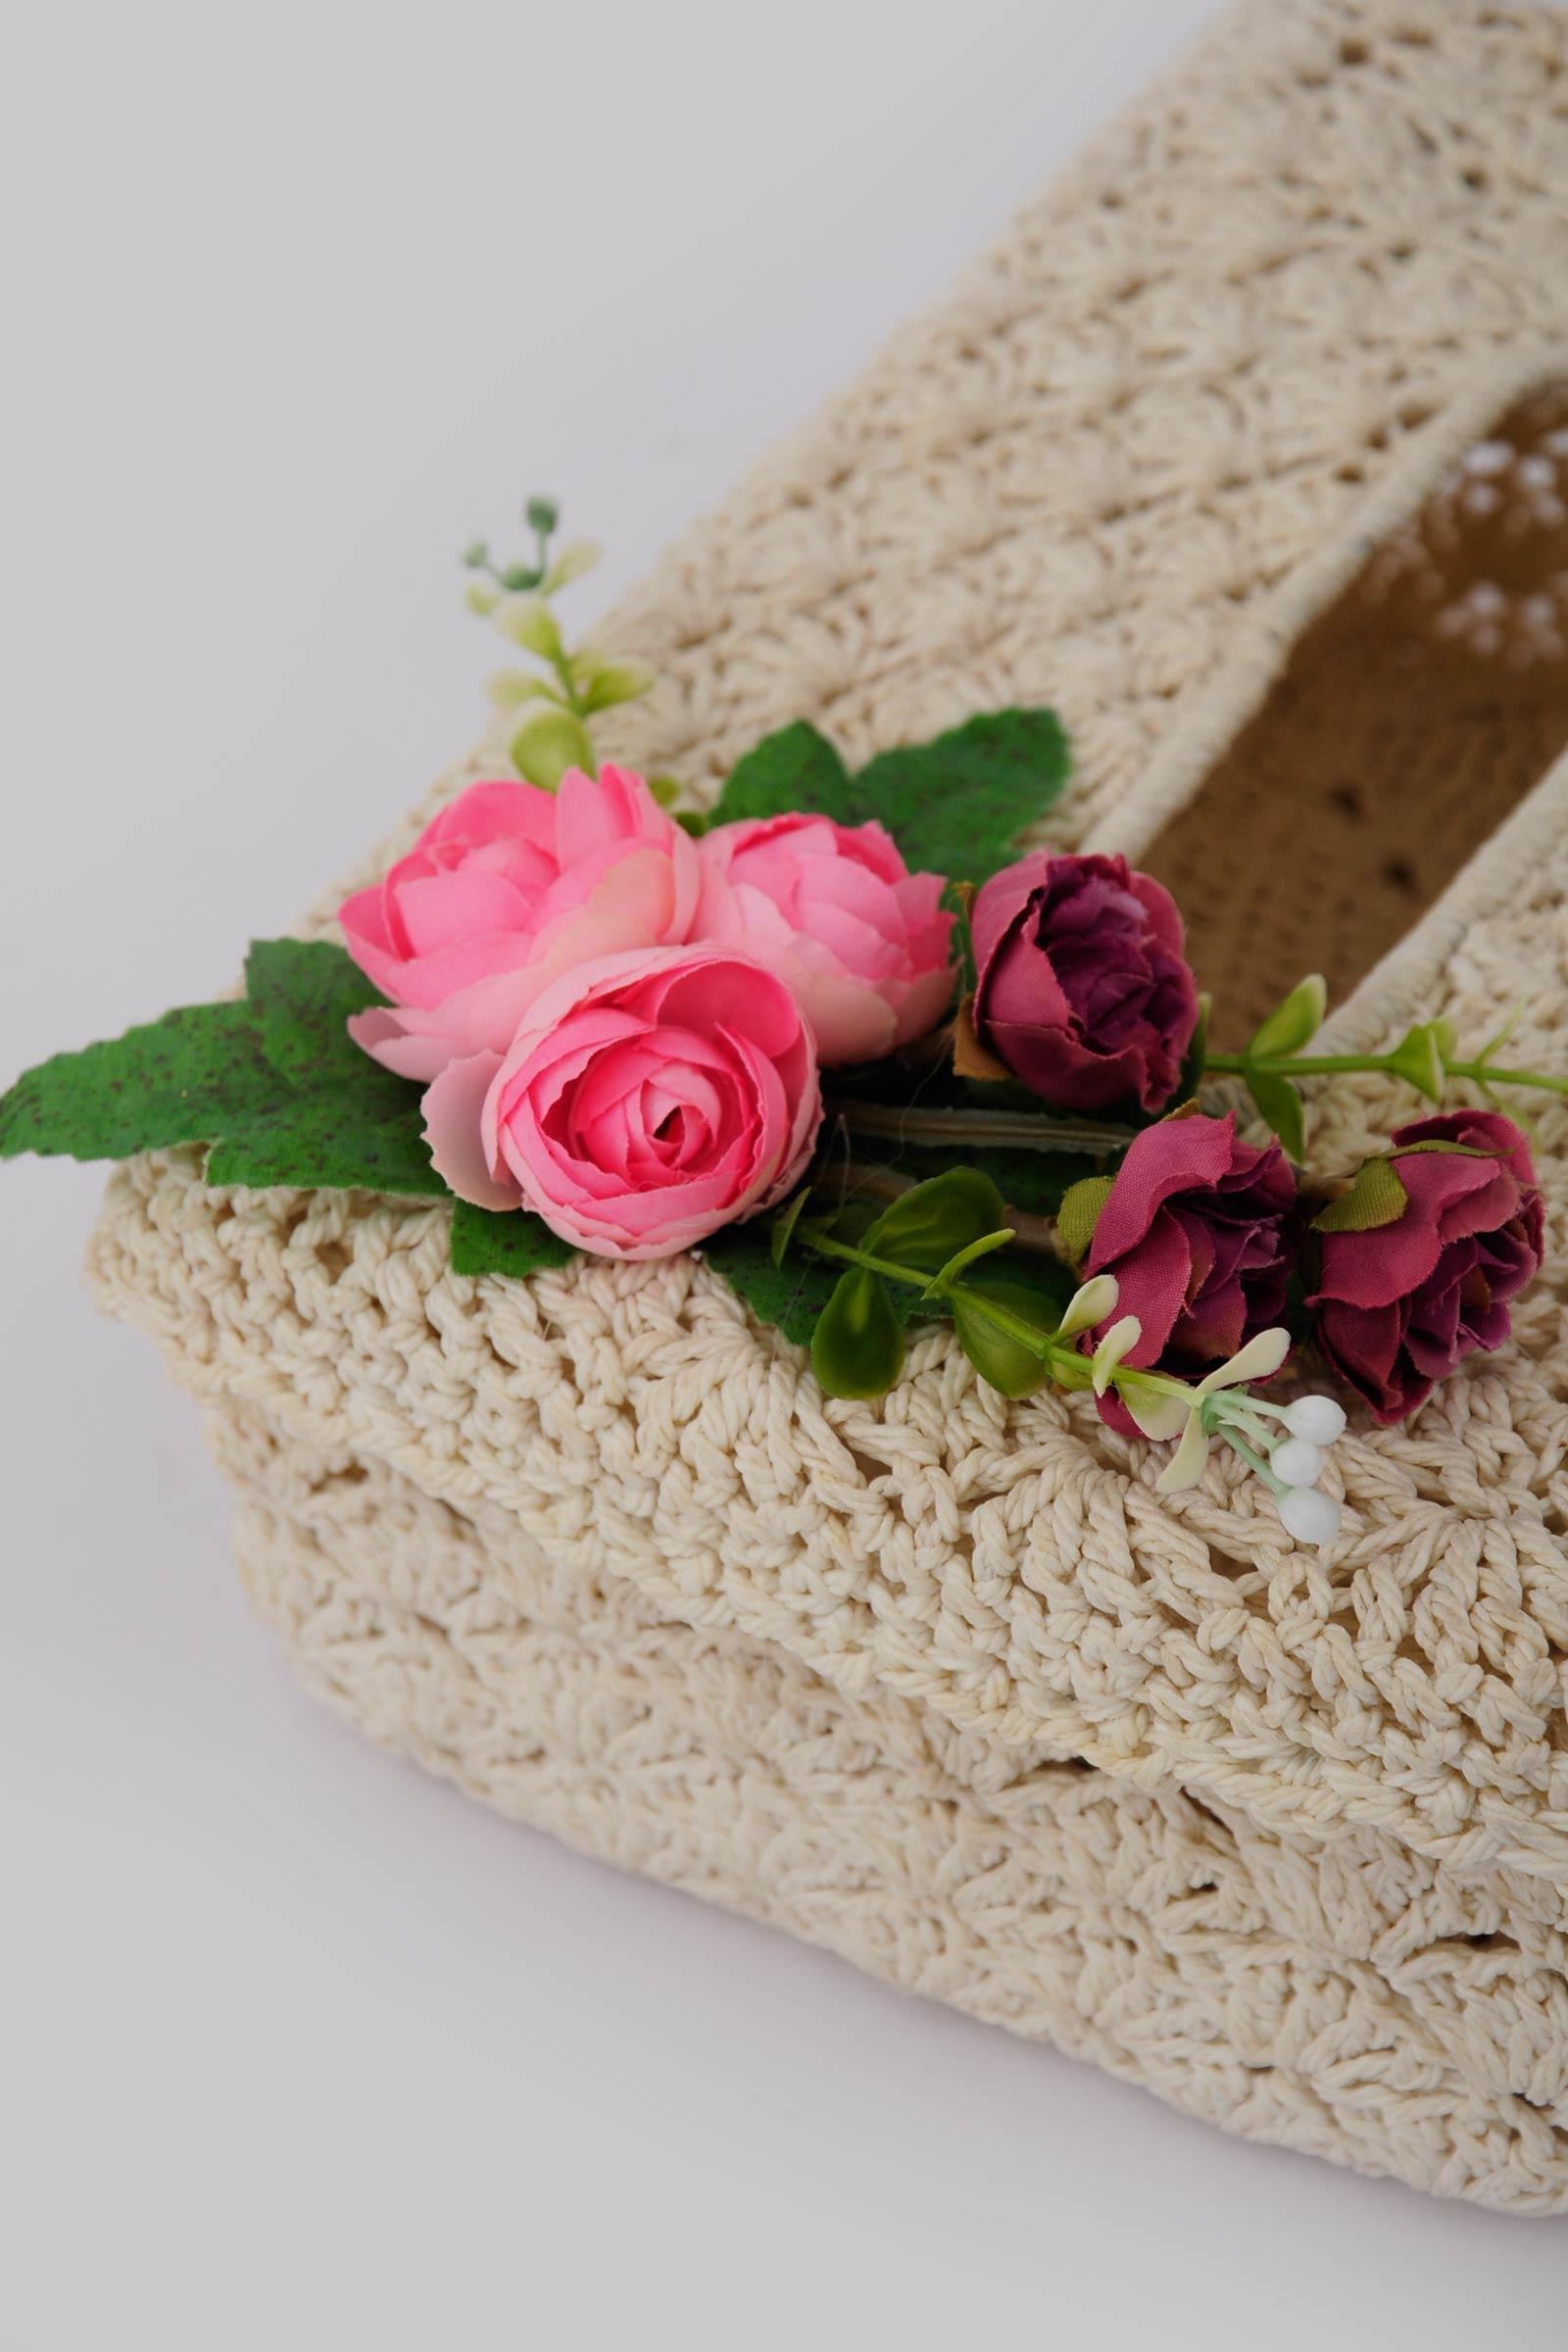 Rose tissue box